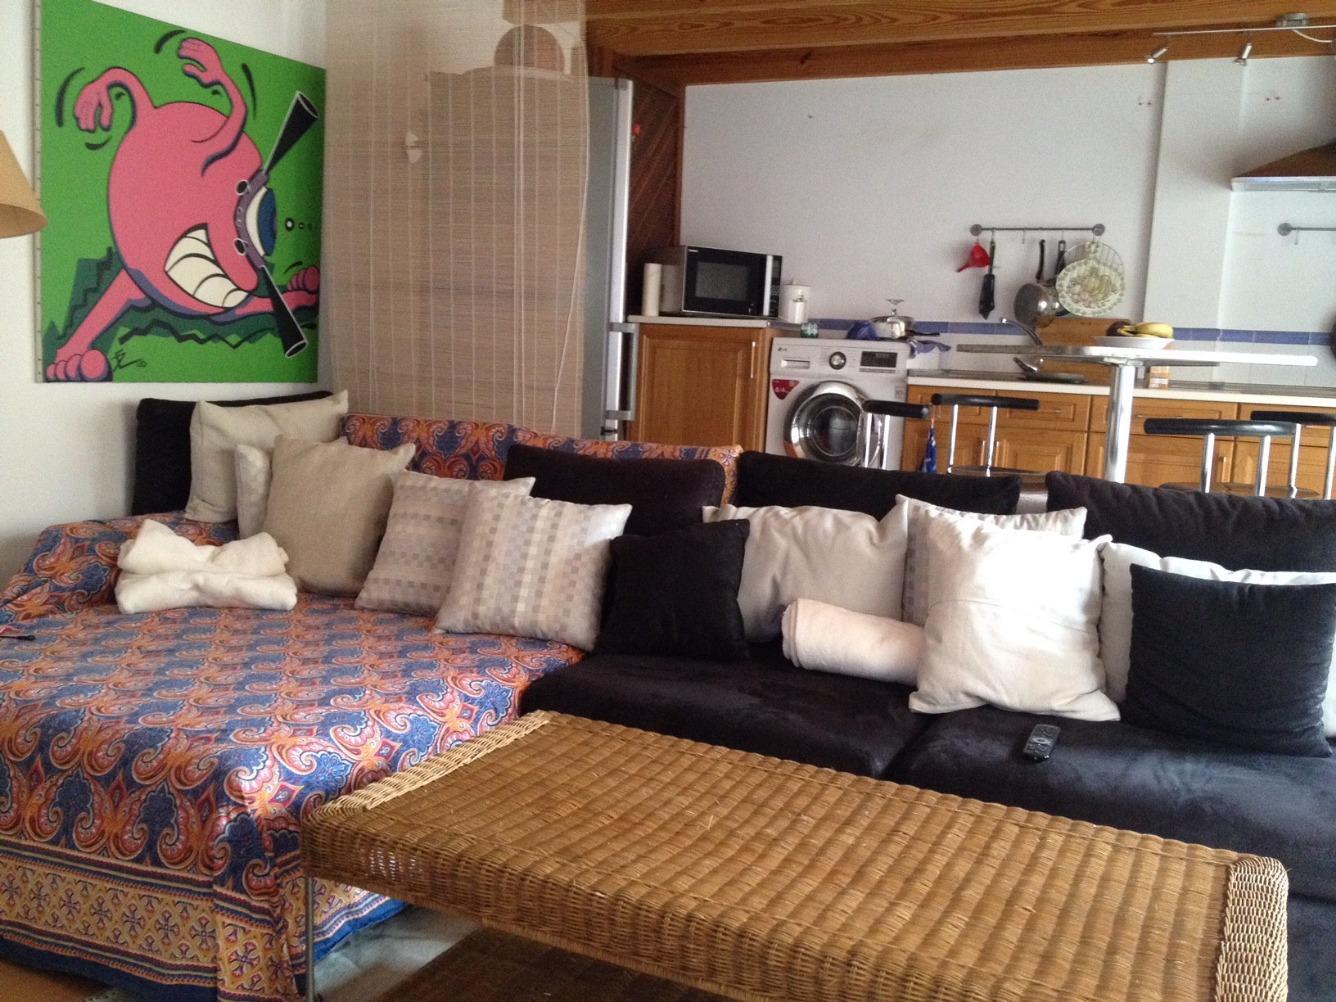 Piso  Sa pobla, zona de - selva. Maravilloso apartamento en antiguo edificio de piedra, totalment